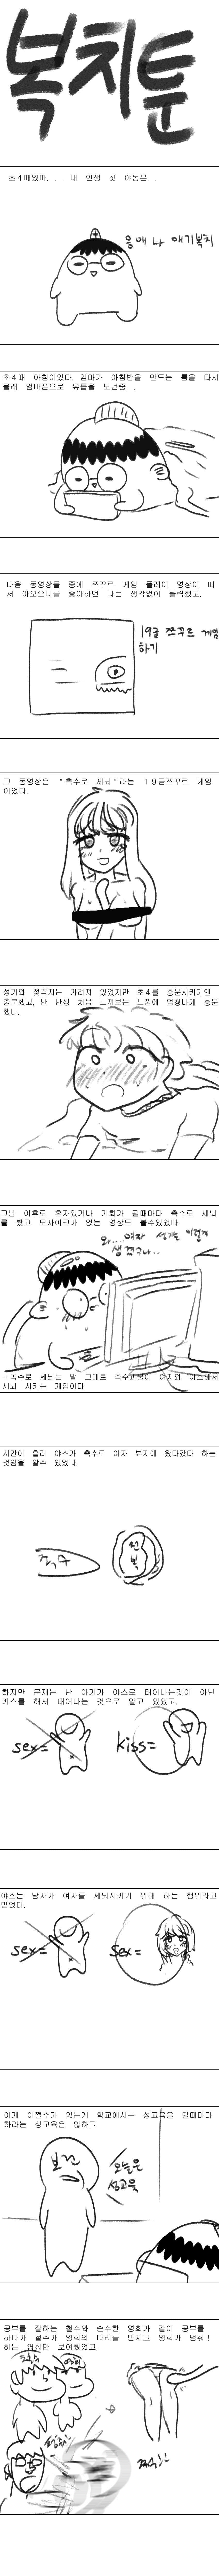 viewimage.php?id=2ebcc232eadd36&no=24b0d769e1d32ca73fec8ffa11d0283194eeae3ea3f7d0da351cf9d3438470123ea28f7a986e65e8bfd25ea967091fdea7515de60688e08b8445903e2cf67264168357